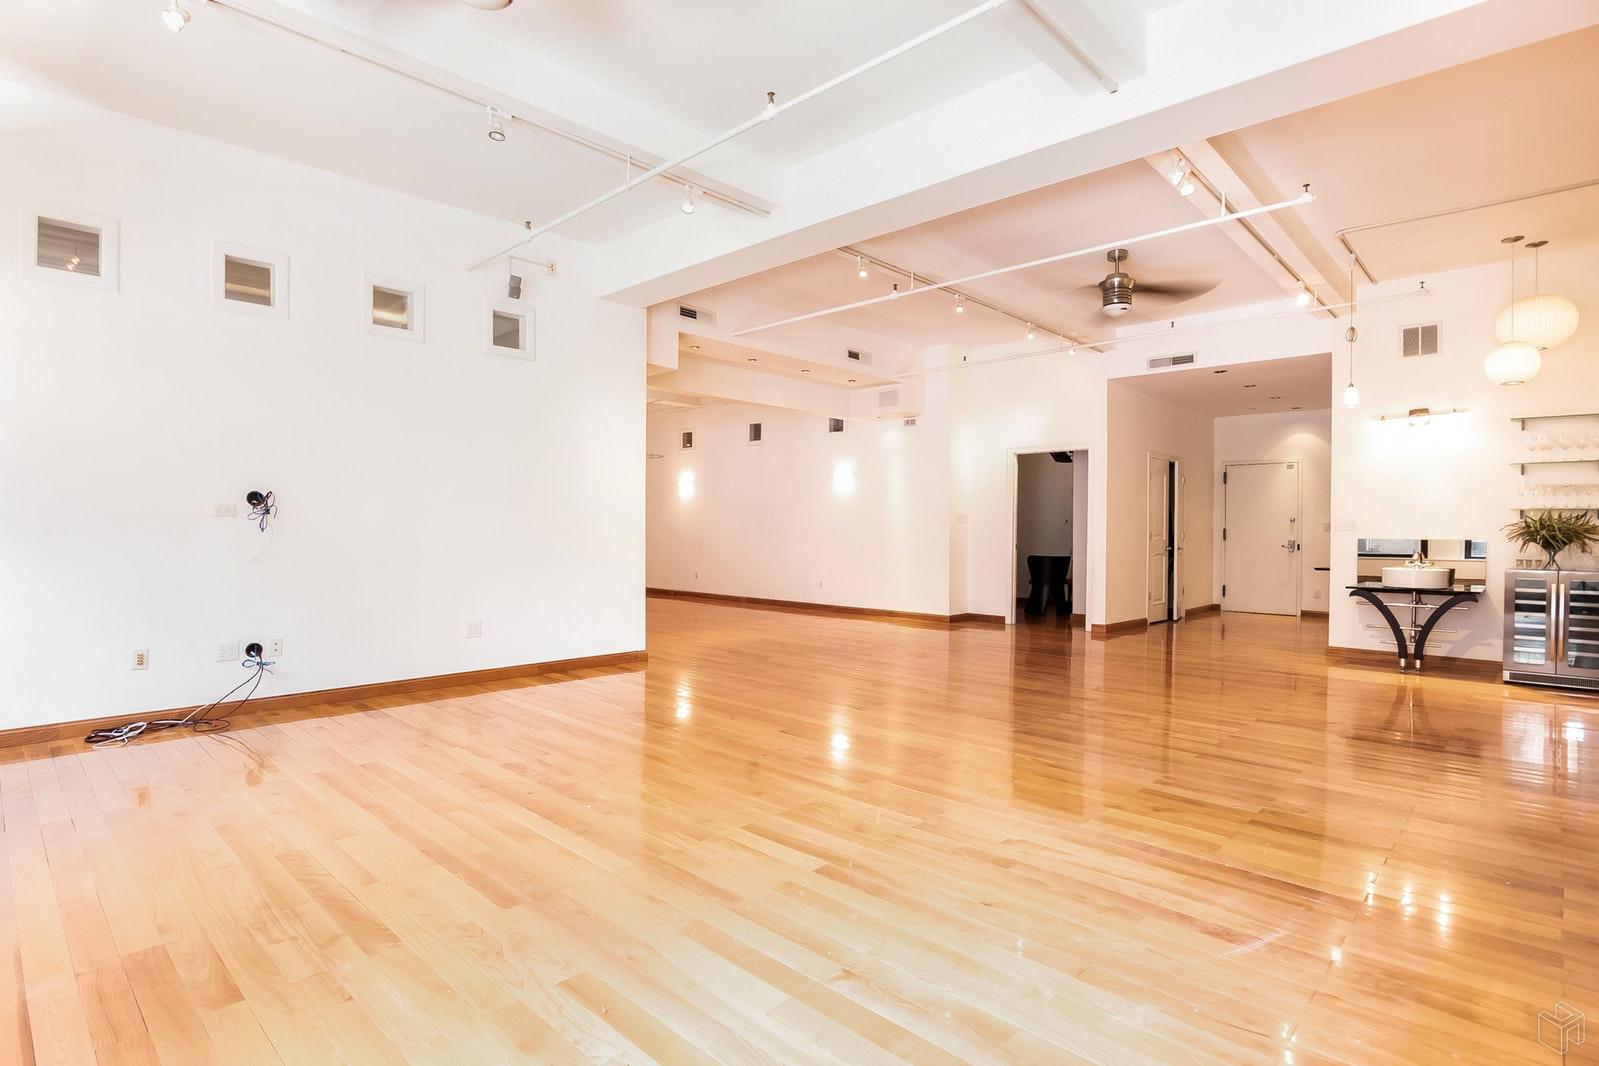 144 WEST 27TH STREET 8R, Chelsea, $11,500, Web #: 19290456